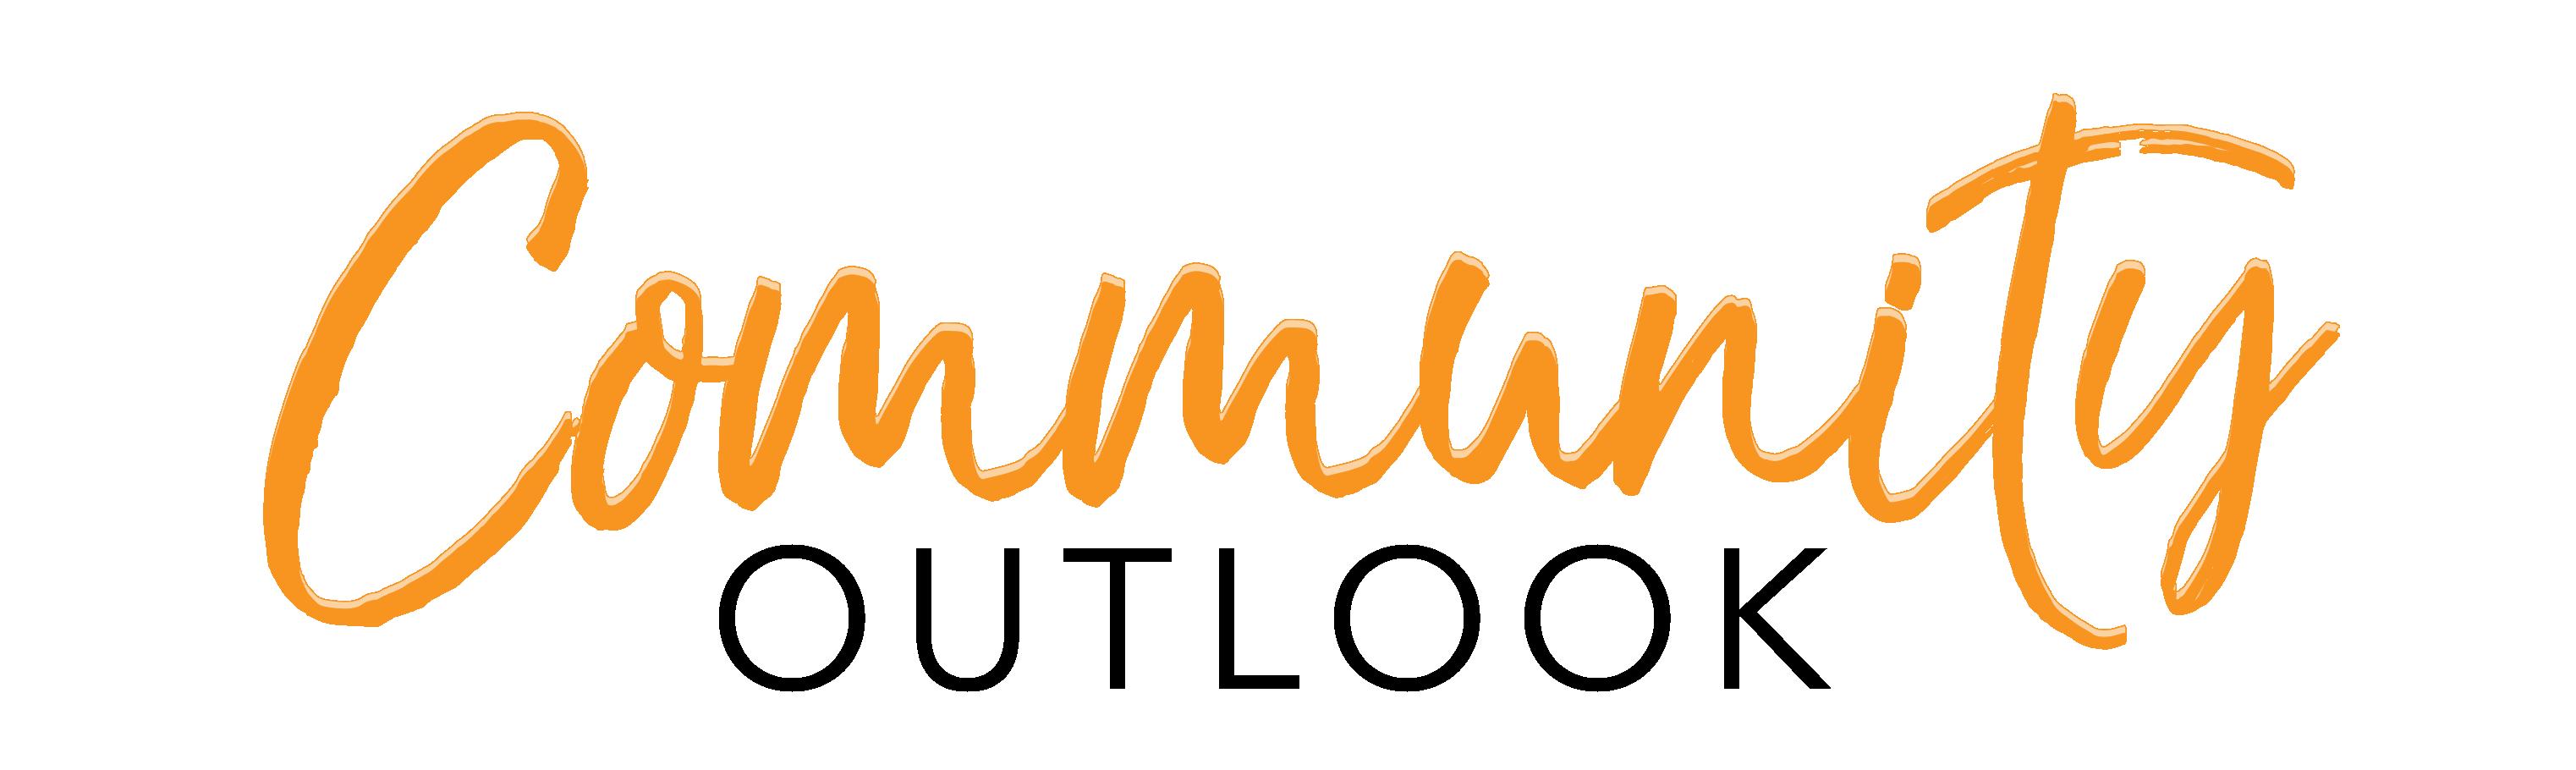 2021 Community Outlook Logo